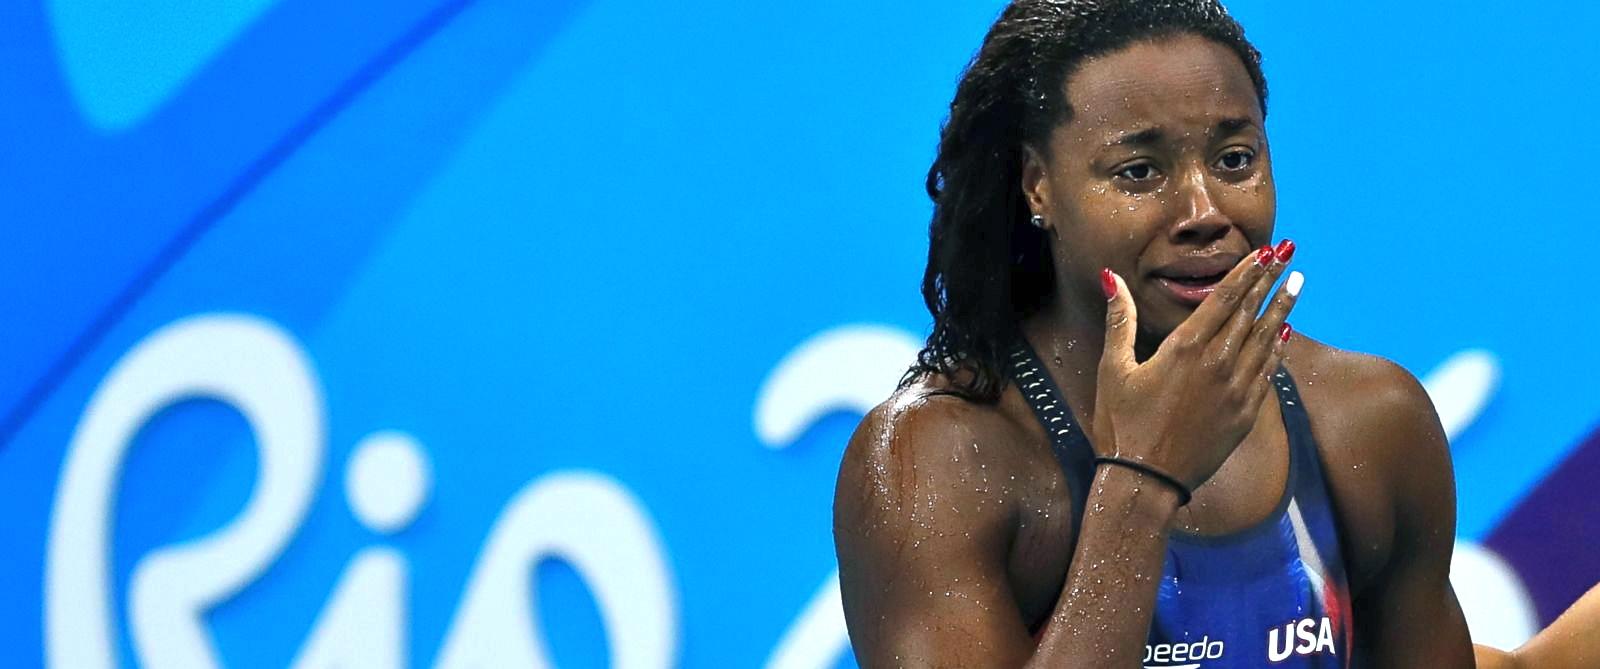 Olympics_swimmer_Manuel_AP_31x13_1600 -2